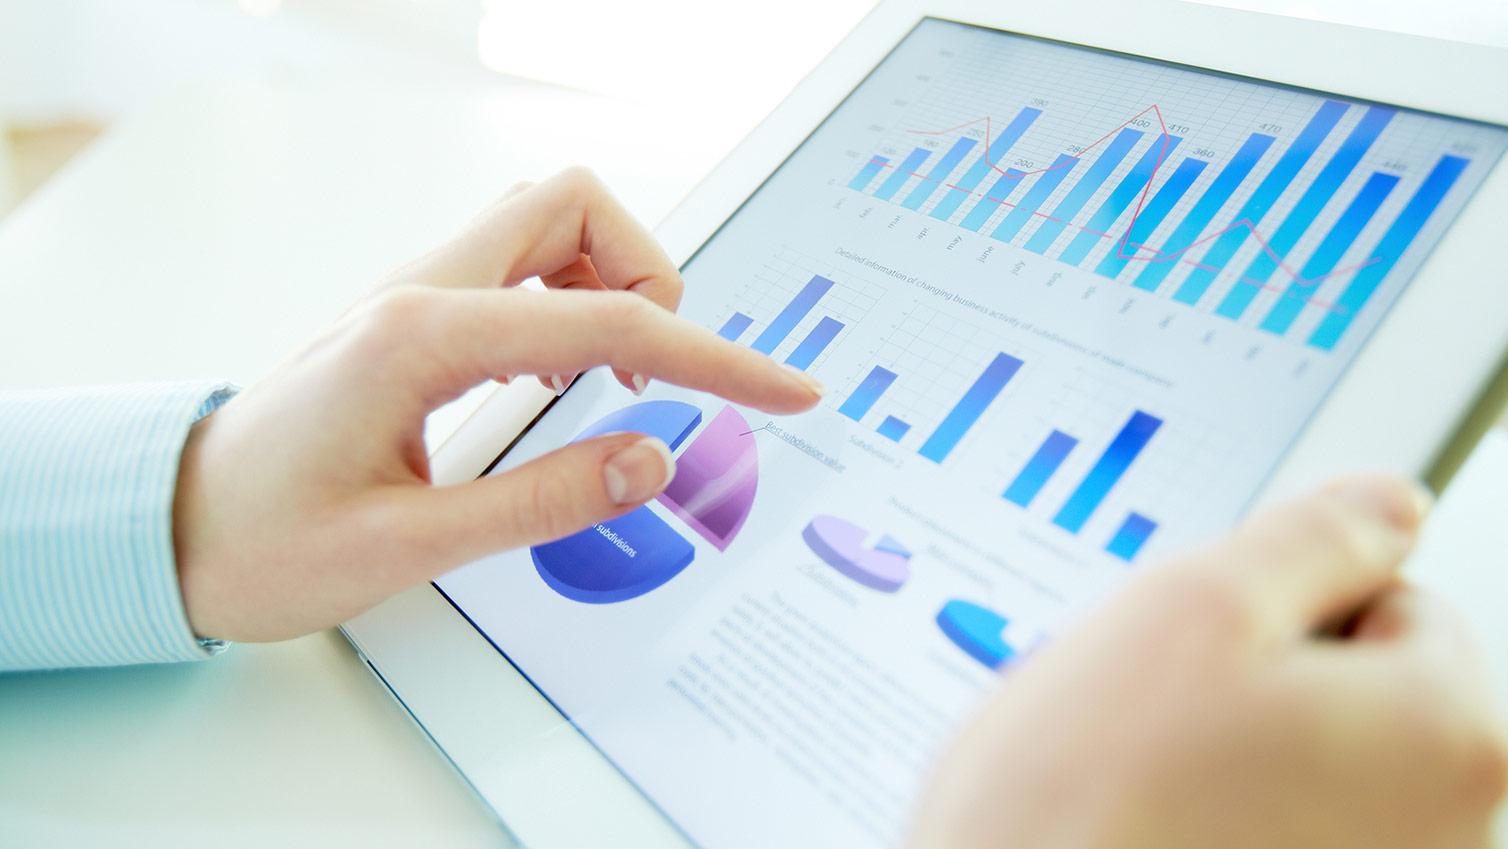 benchmark , benchmarking, product design, innovation